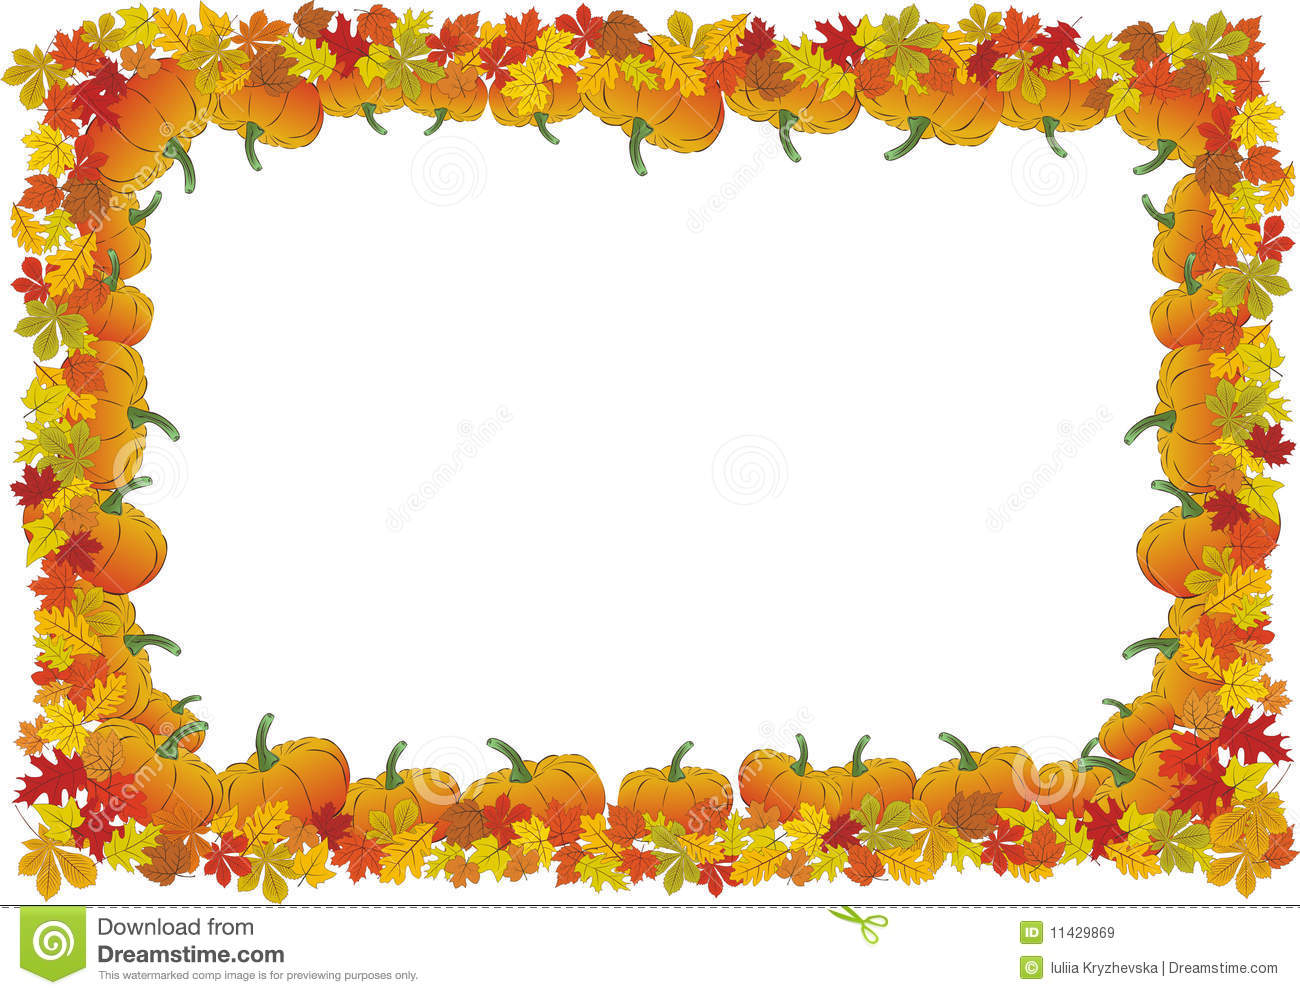 07368c634f5f27fd8cac6b2caf3493 ... 07368-07368c634f5f27fd8cac6b2caf3493 ... 07368c634f5f27fd8cac6b2caf3493 ... Thanksgiving Frame Clipart-0